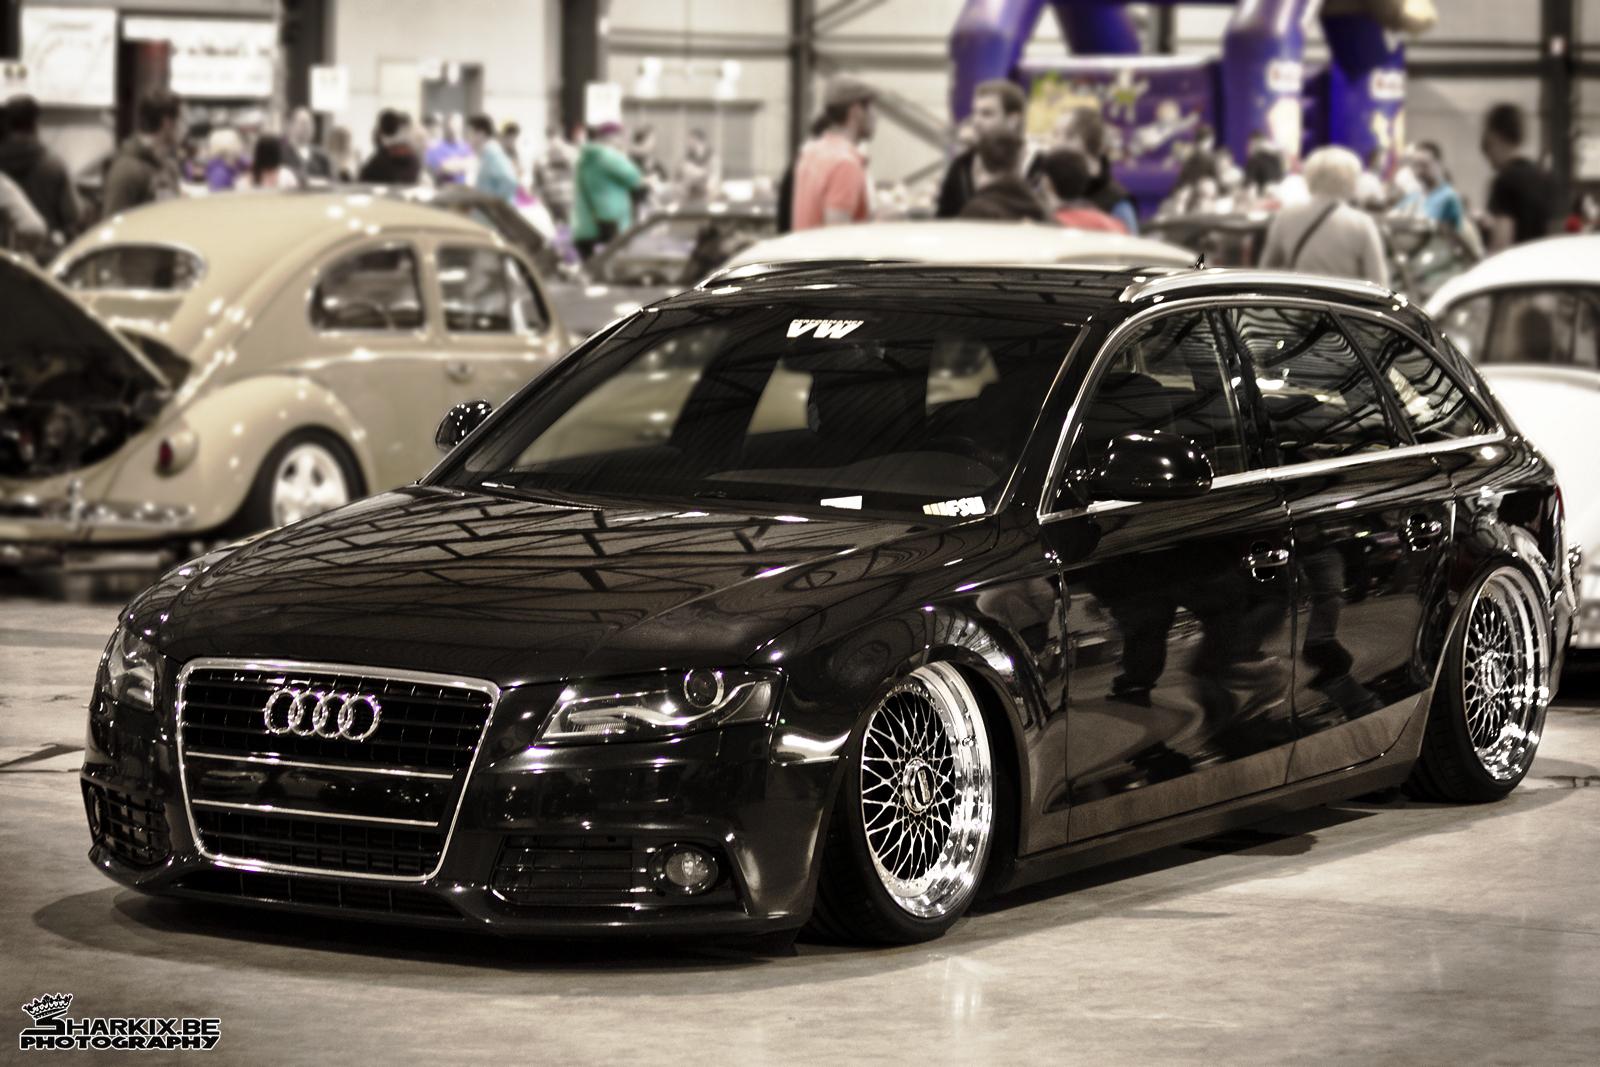 Audi a4 b8 avant on bbs wheels low inspiring oh i can t wait cars pinterest bbs wheels audi a4 and audi